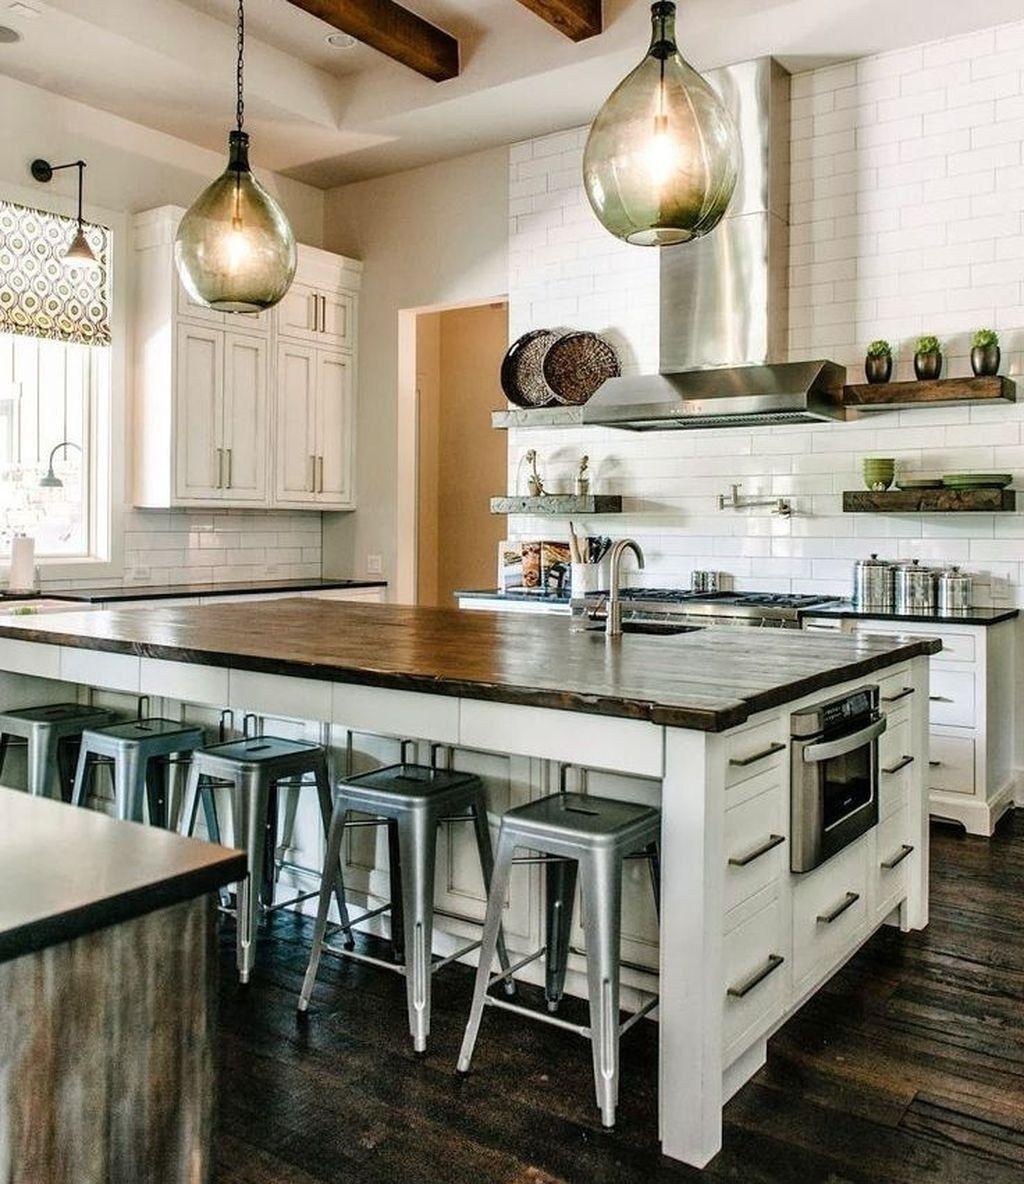 Chic Modern Farmhouse Kitchen Decor Ideas 8  Industrial style